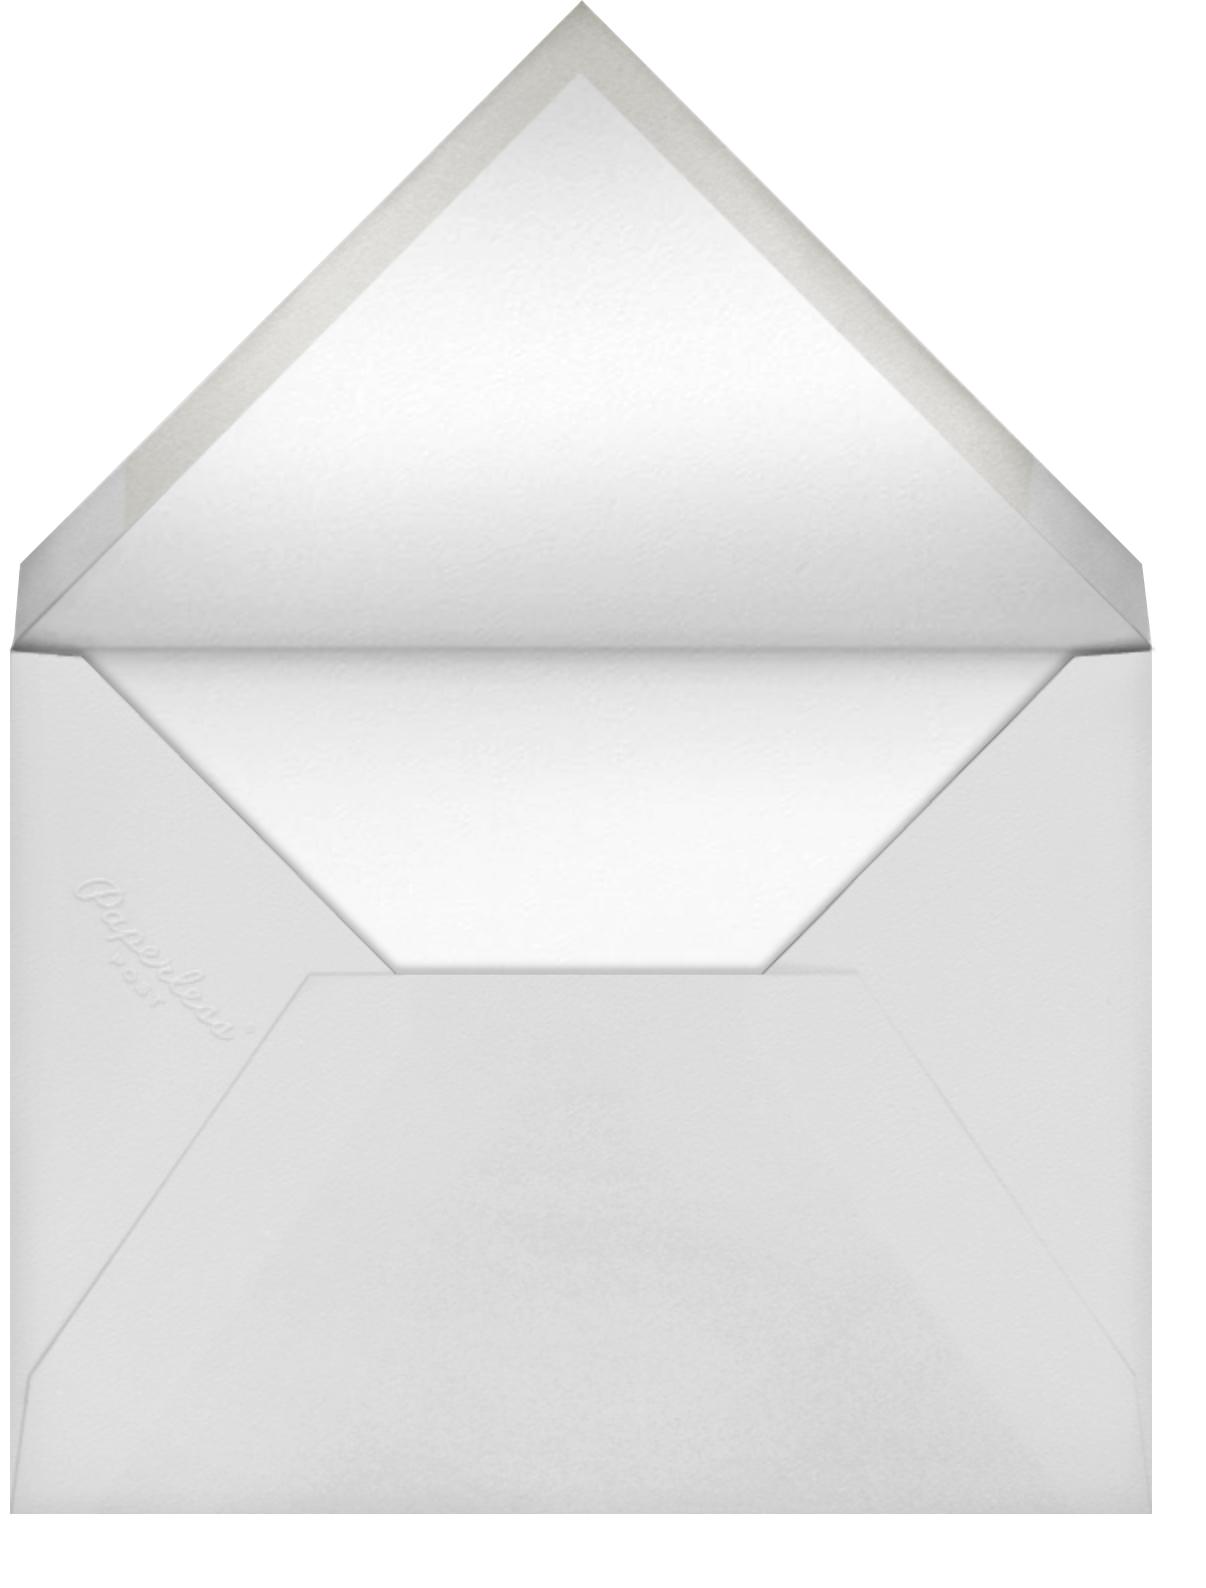 Scribbled Circles (Stationery) - Ashley G - null - envelope back